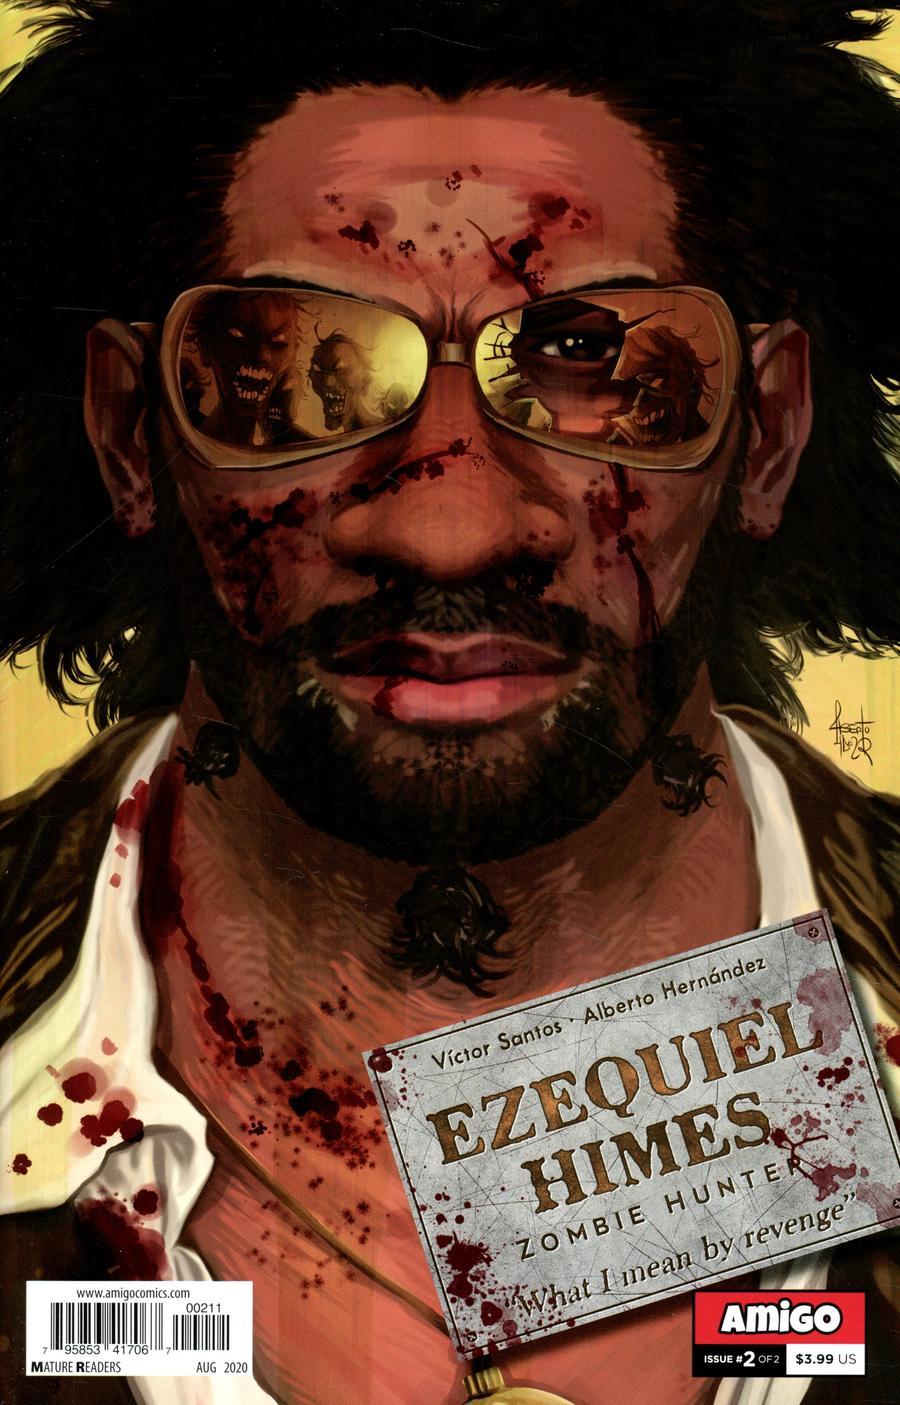 Ezequiel Himes Zombie Hunter #2